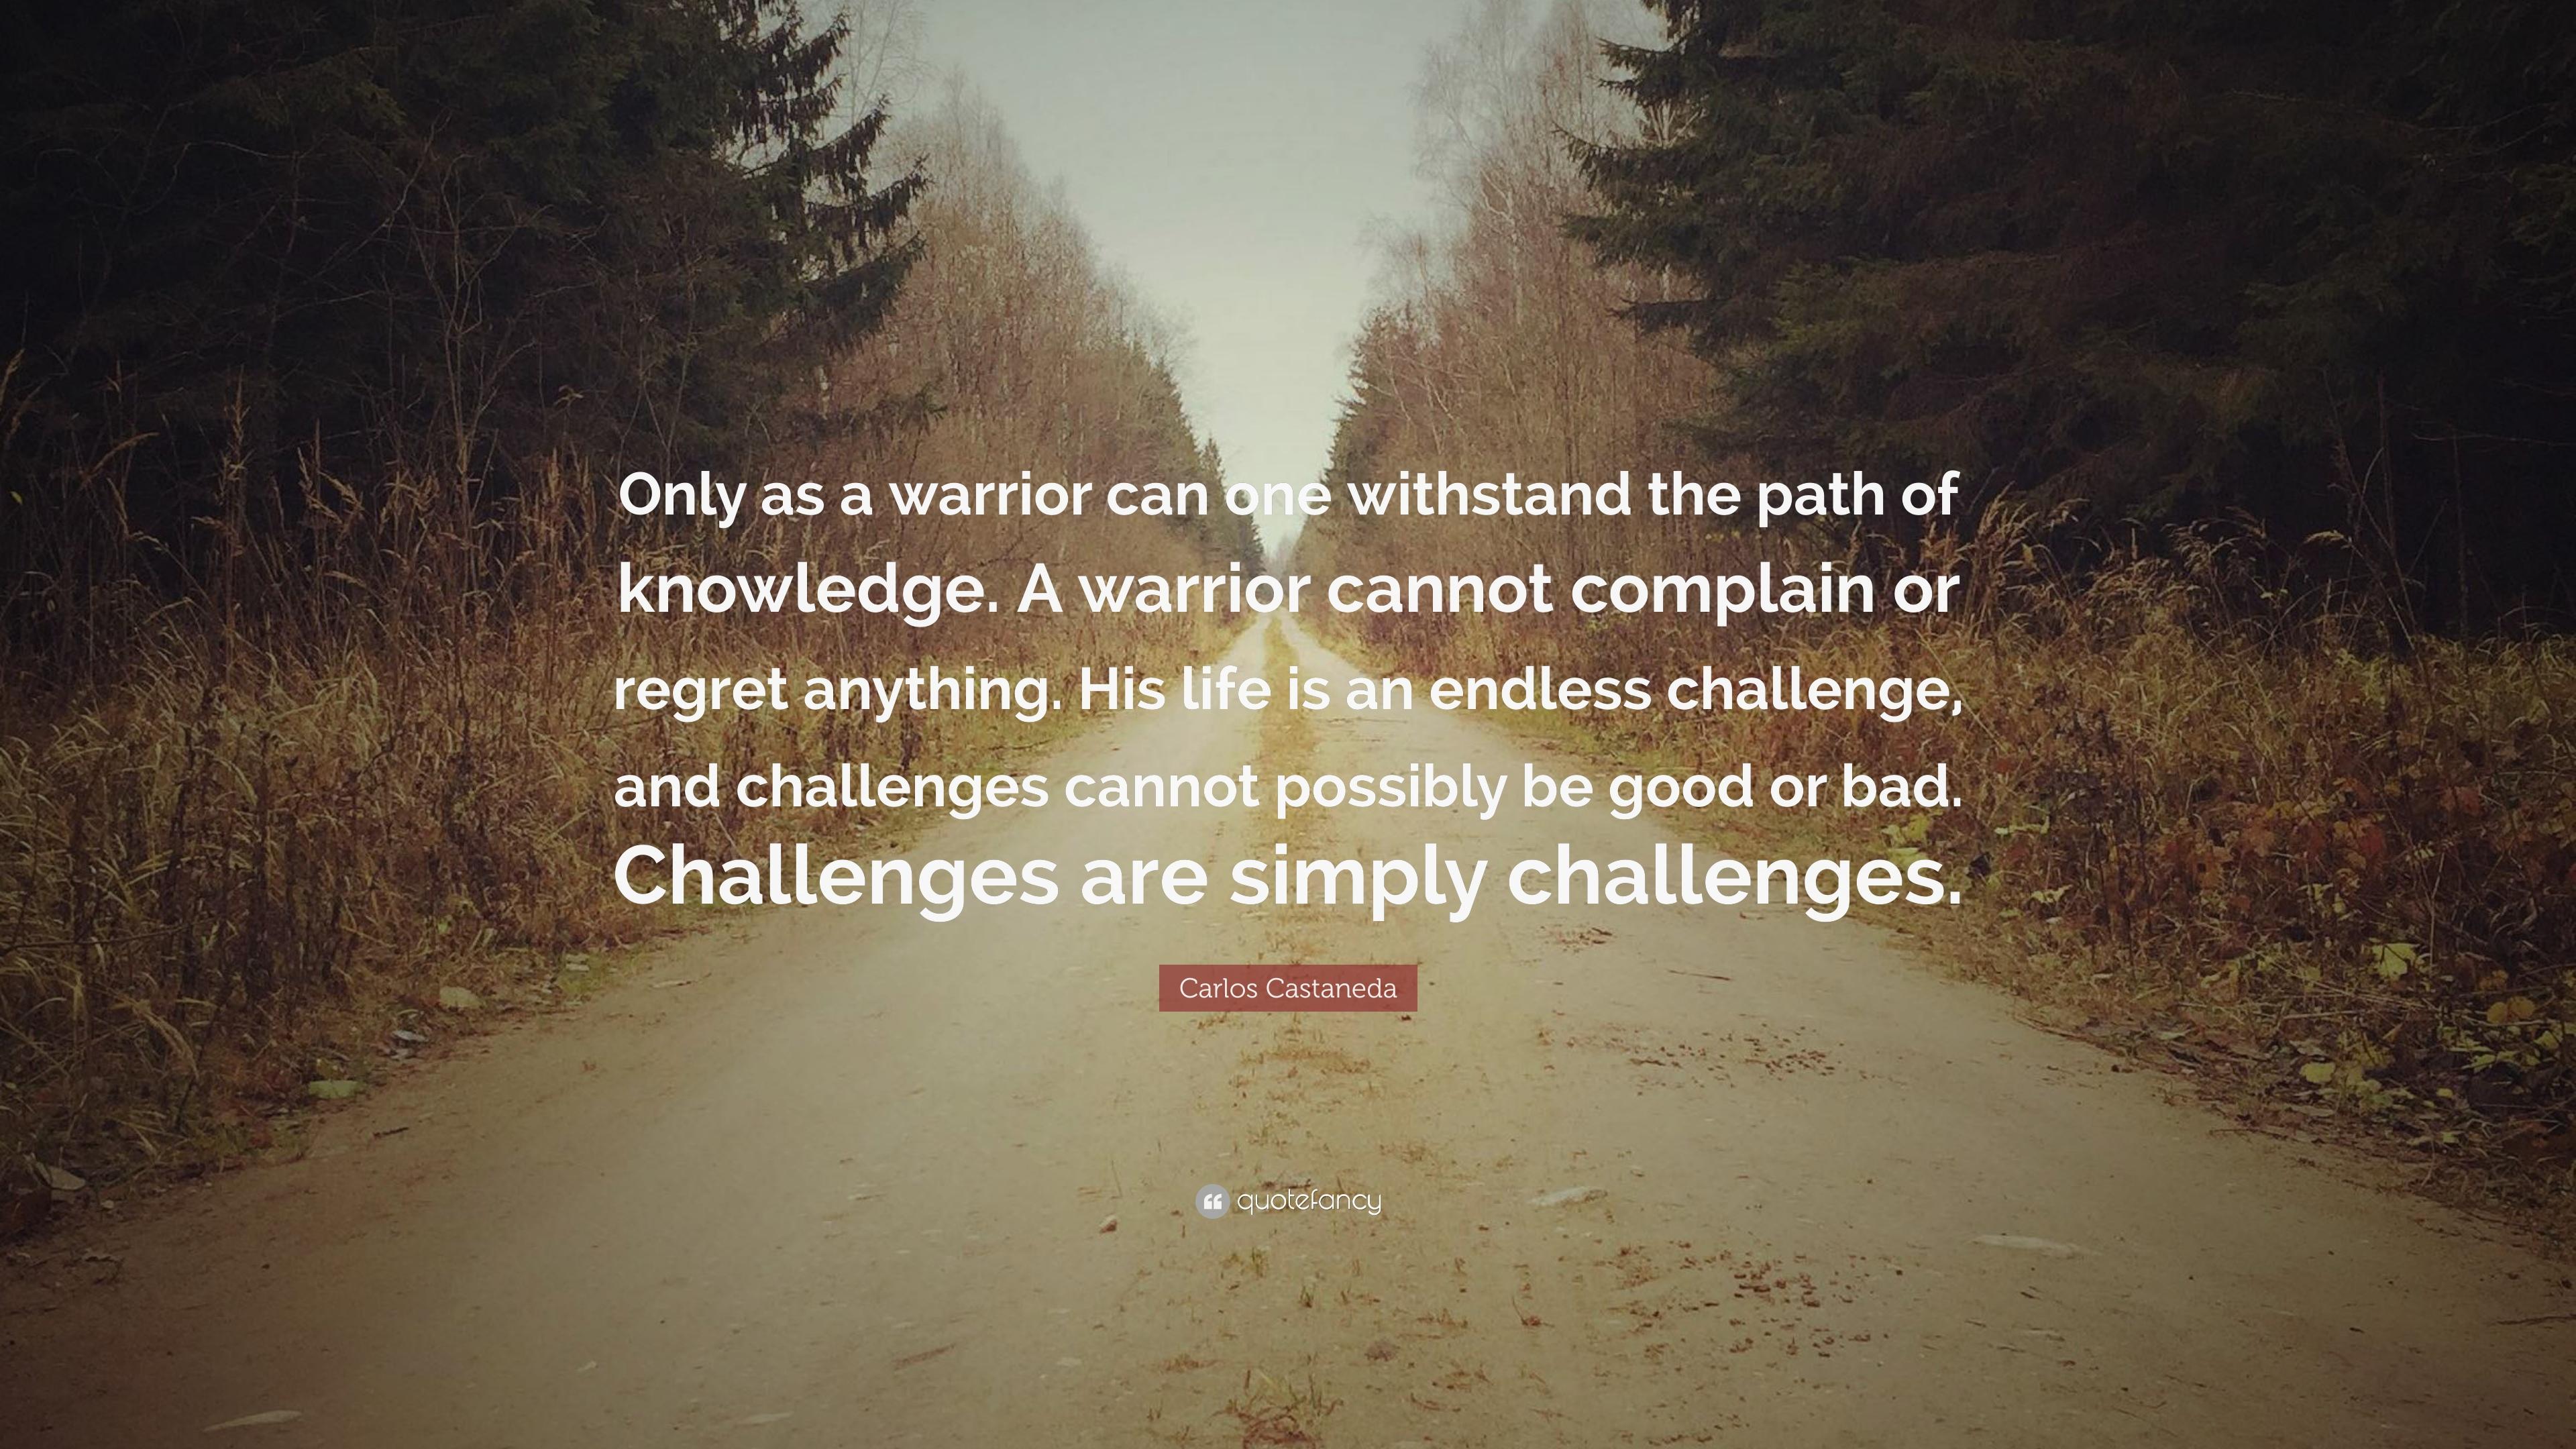 Carlos Castaneda Warrior Quotes Facebook thumbnail